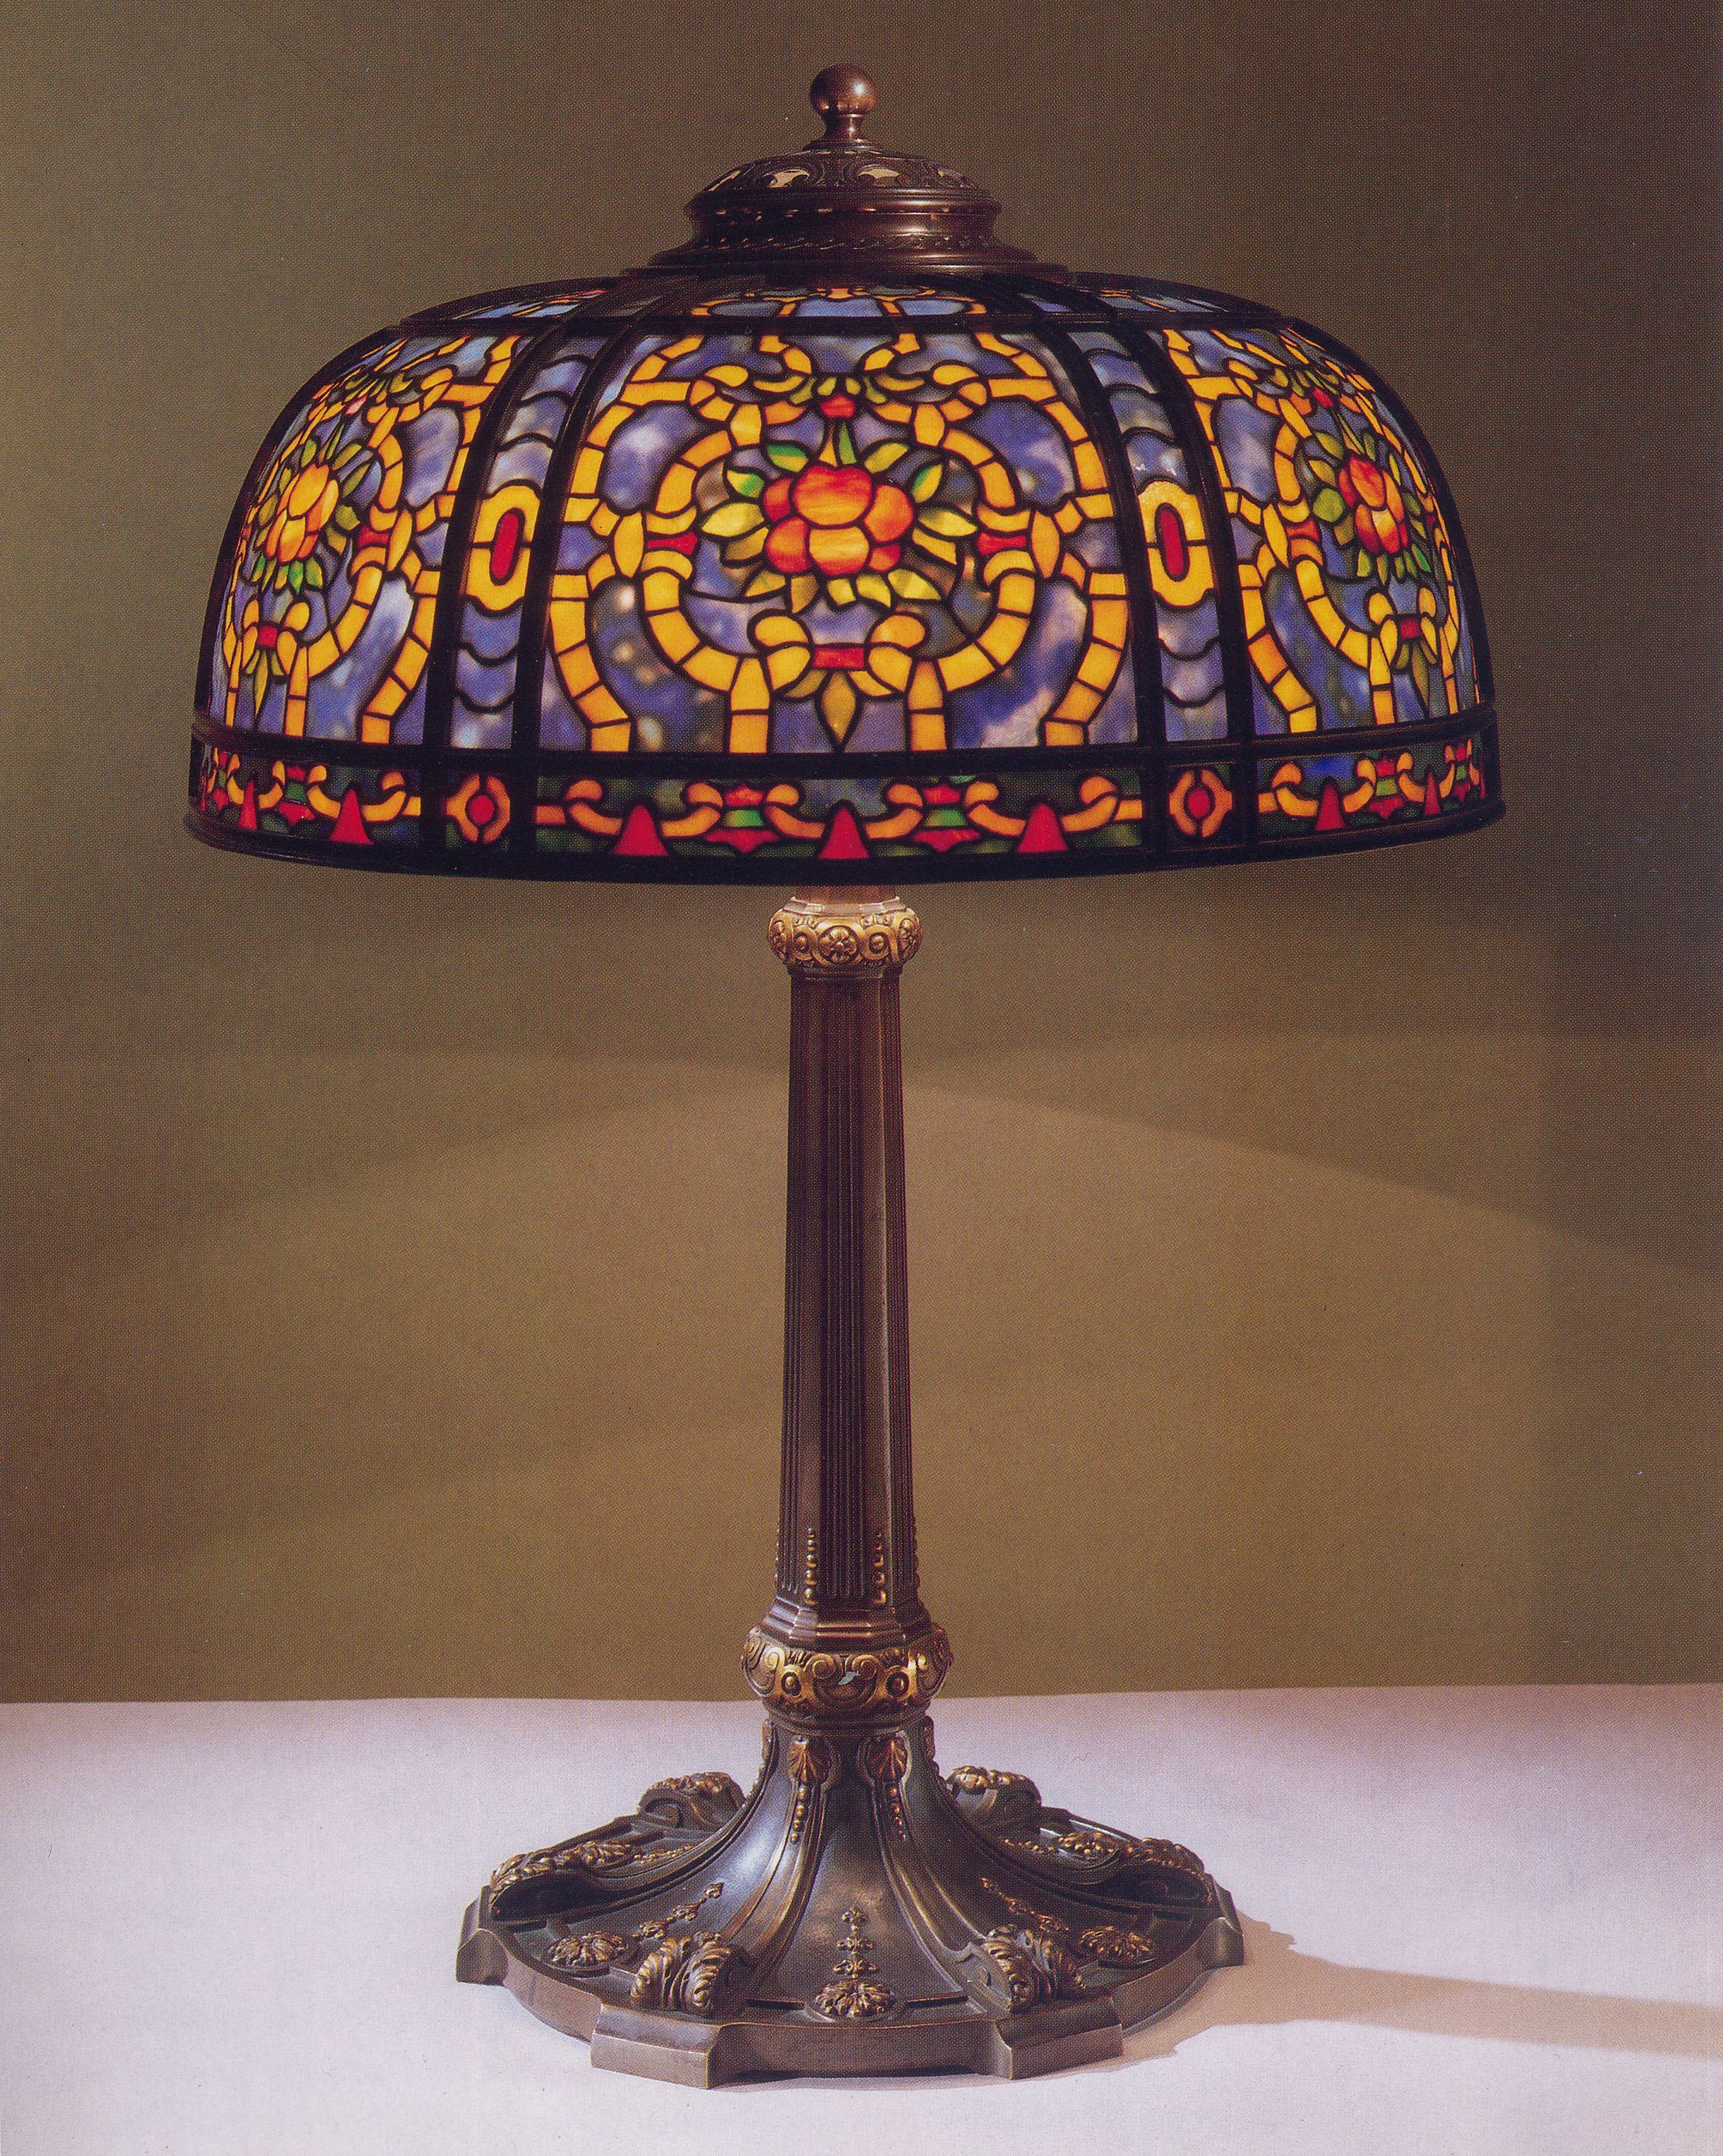 Lamp Geometric Table Lamp 1a Image 27 Genuine Tiffany Lamps